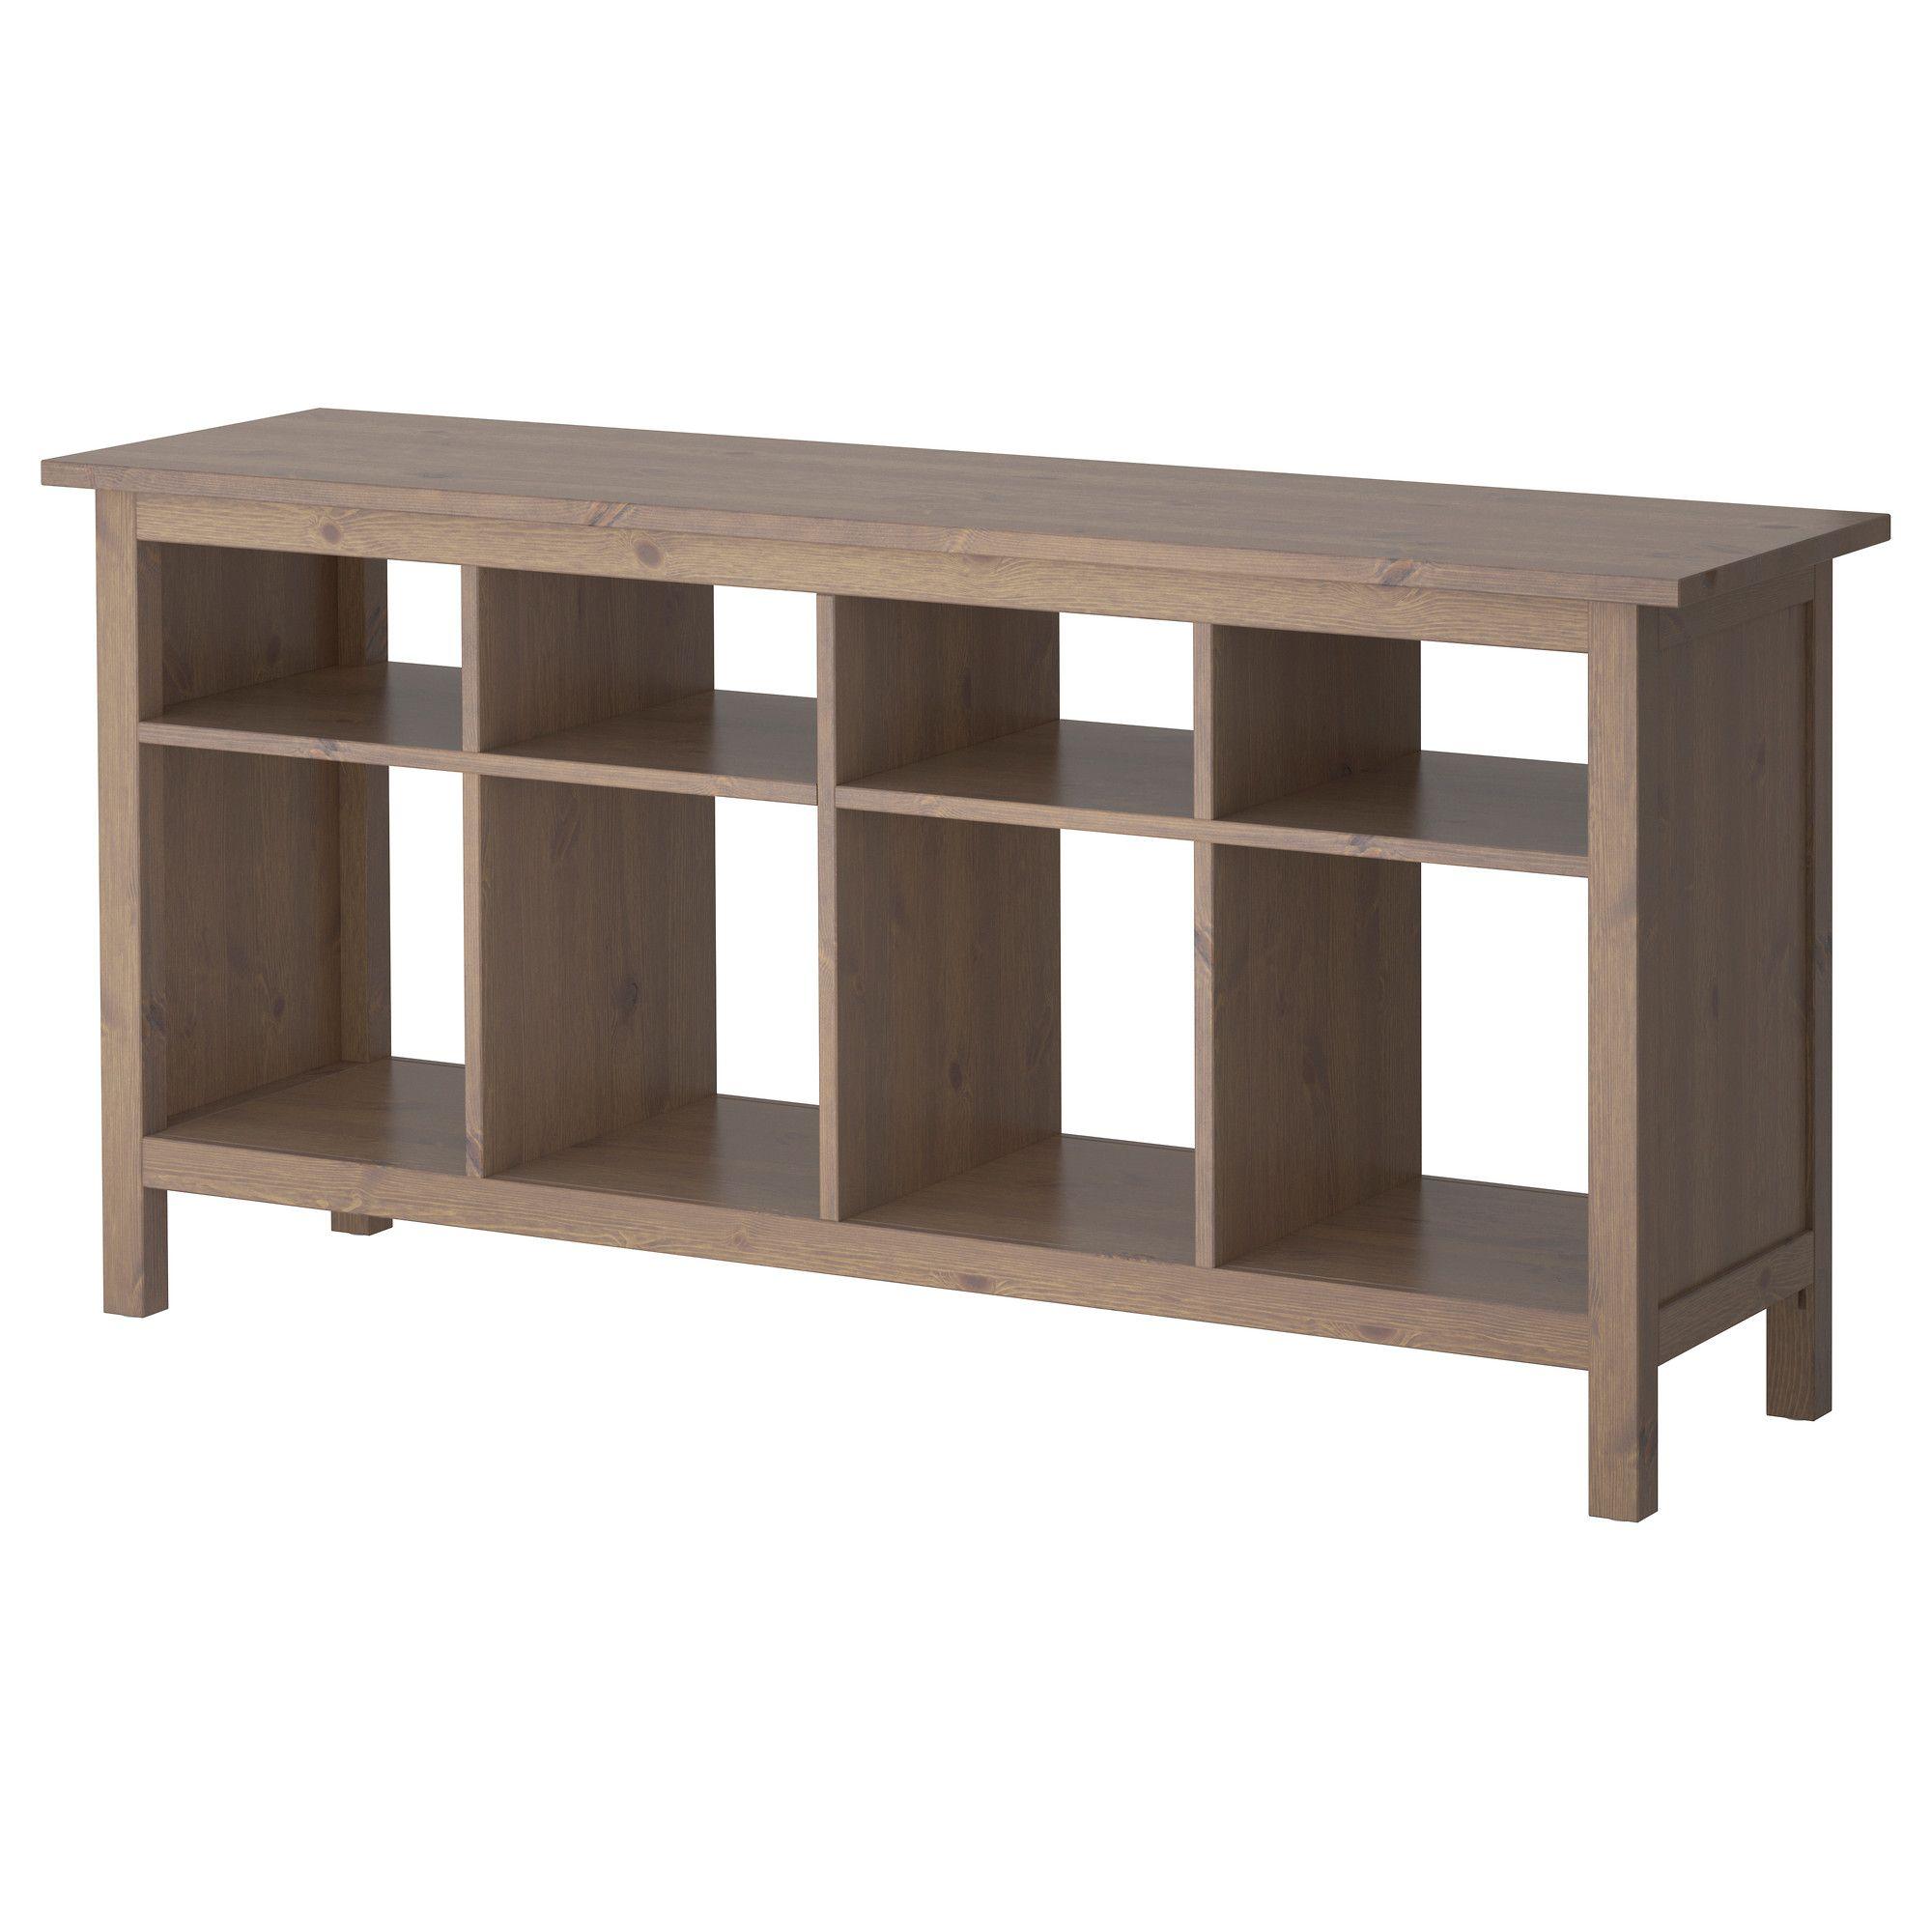 Amazing HEMNES Sofa Table   Gray Brown   IKEA...$179, Add Baskets